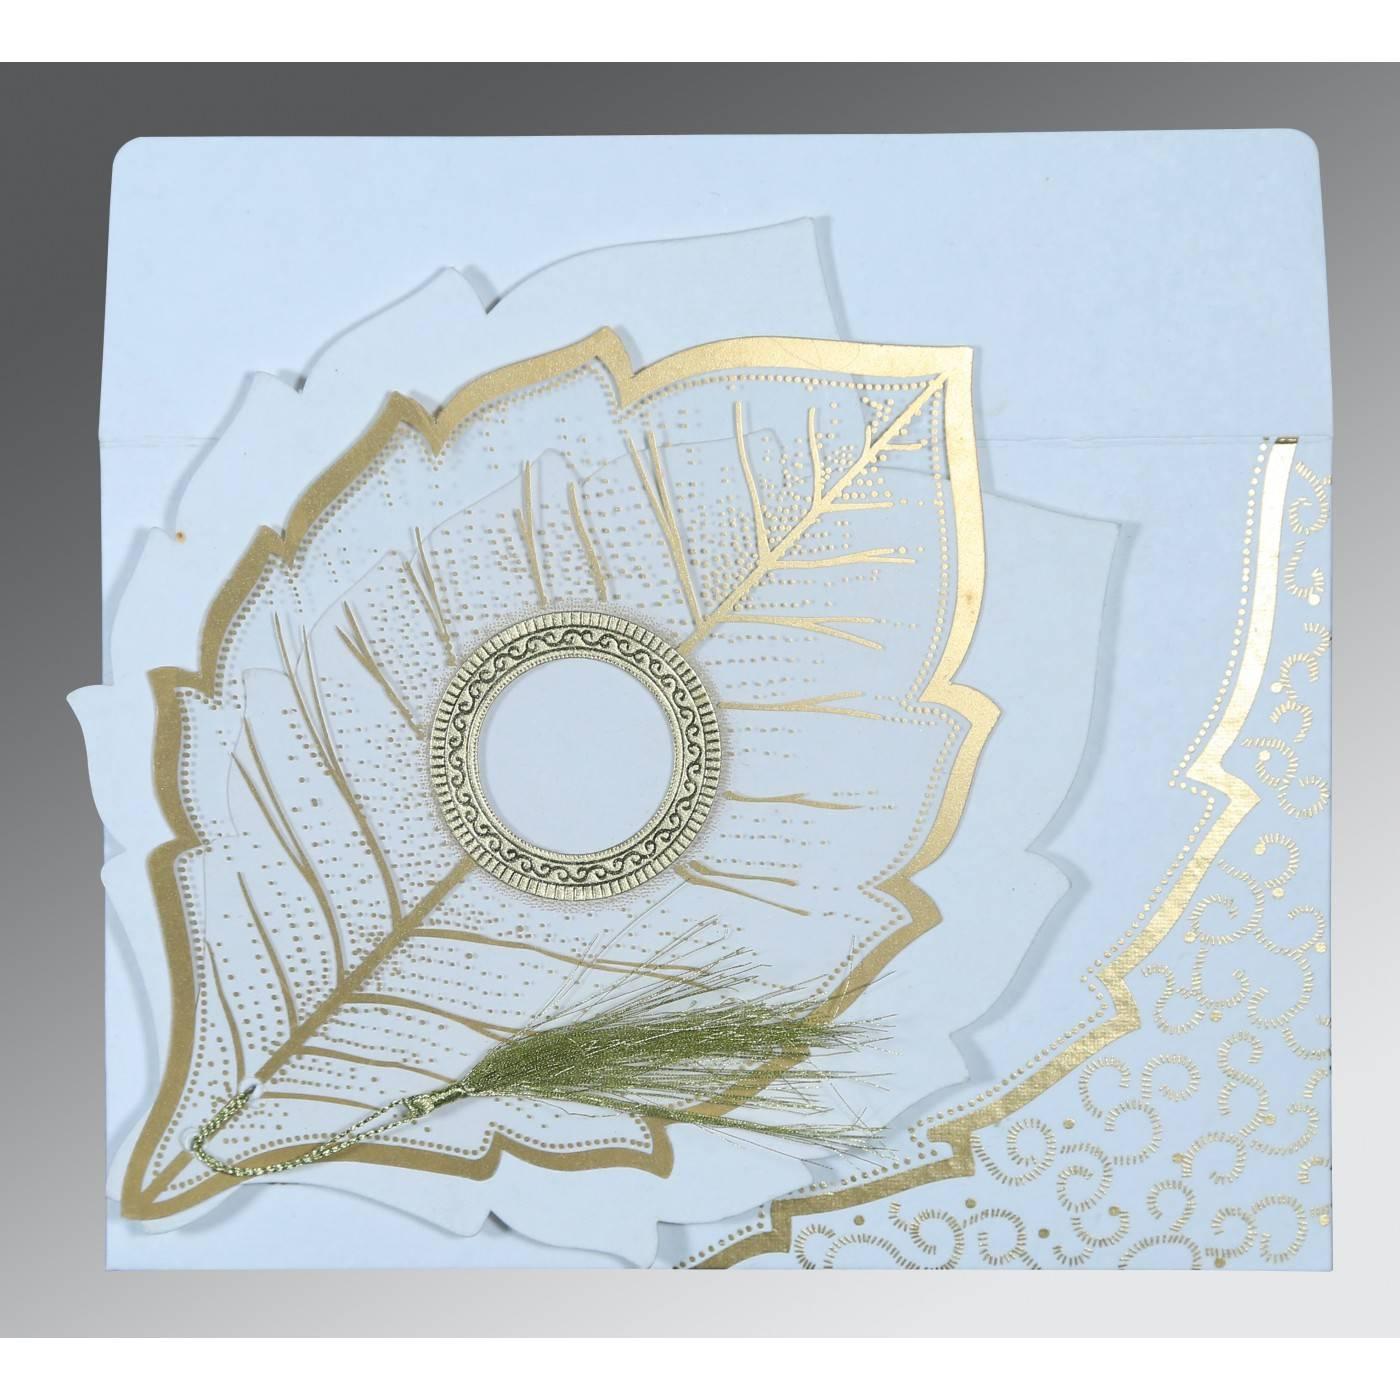 WHITE TRANSPARENT HANDMADE COTTON FLORAL THEMED - FOIL STAMPED WEDDING CARD : CRU-8219H - IndianWeddingCards